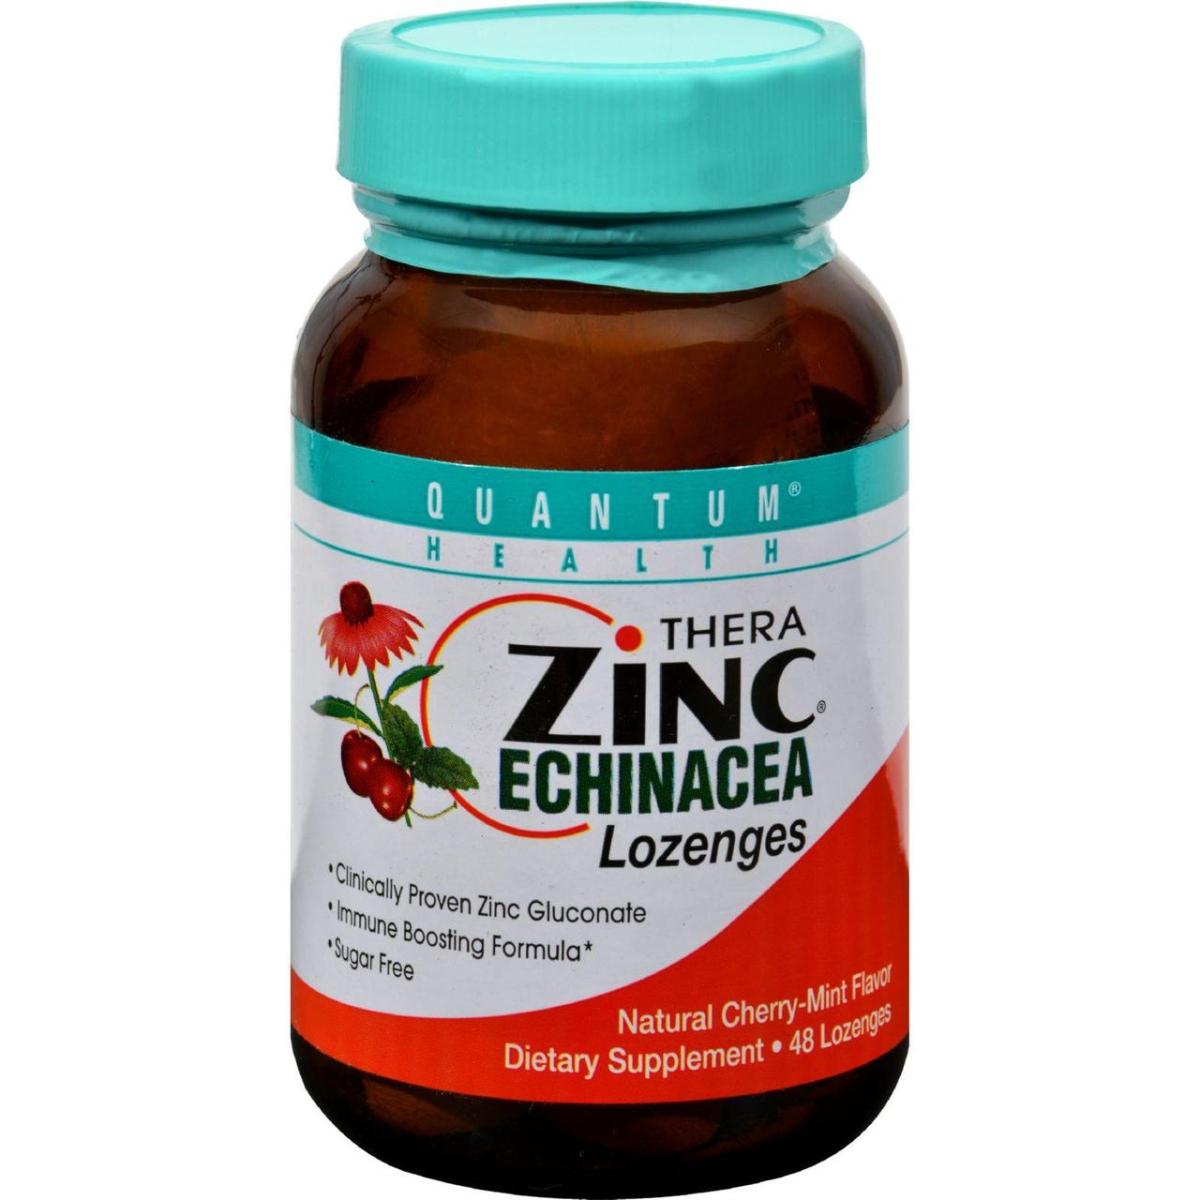 Quantum Research HG0286765 Quantum Thera Zinc Echinacea Lozenges - Cherry Mint - 48 Lozenges